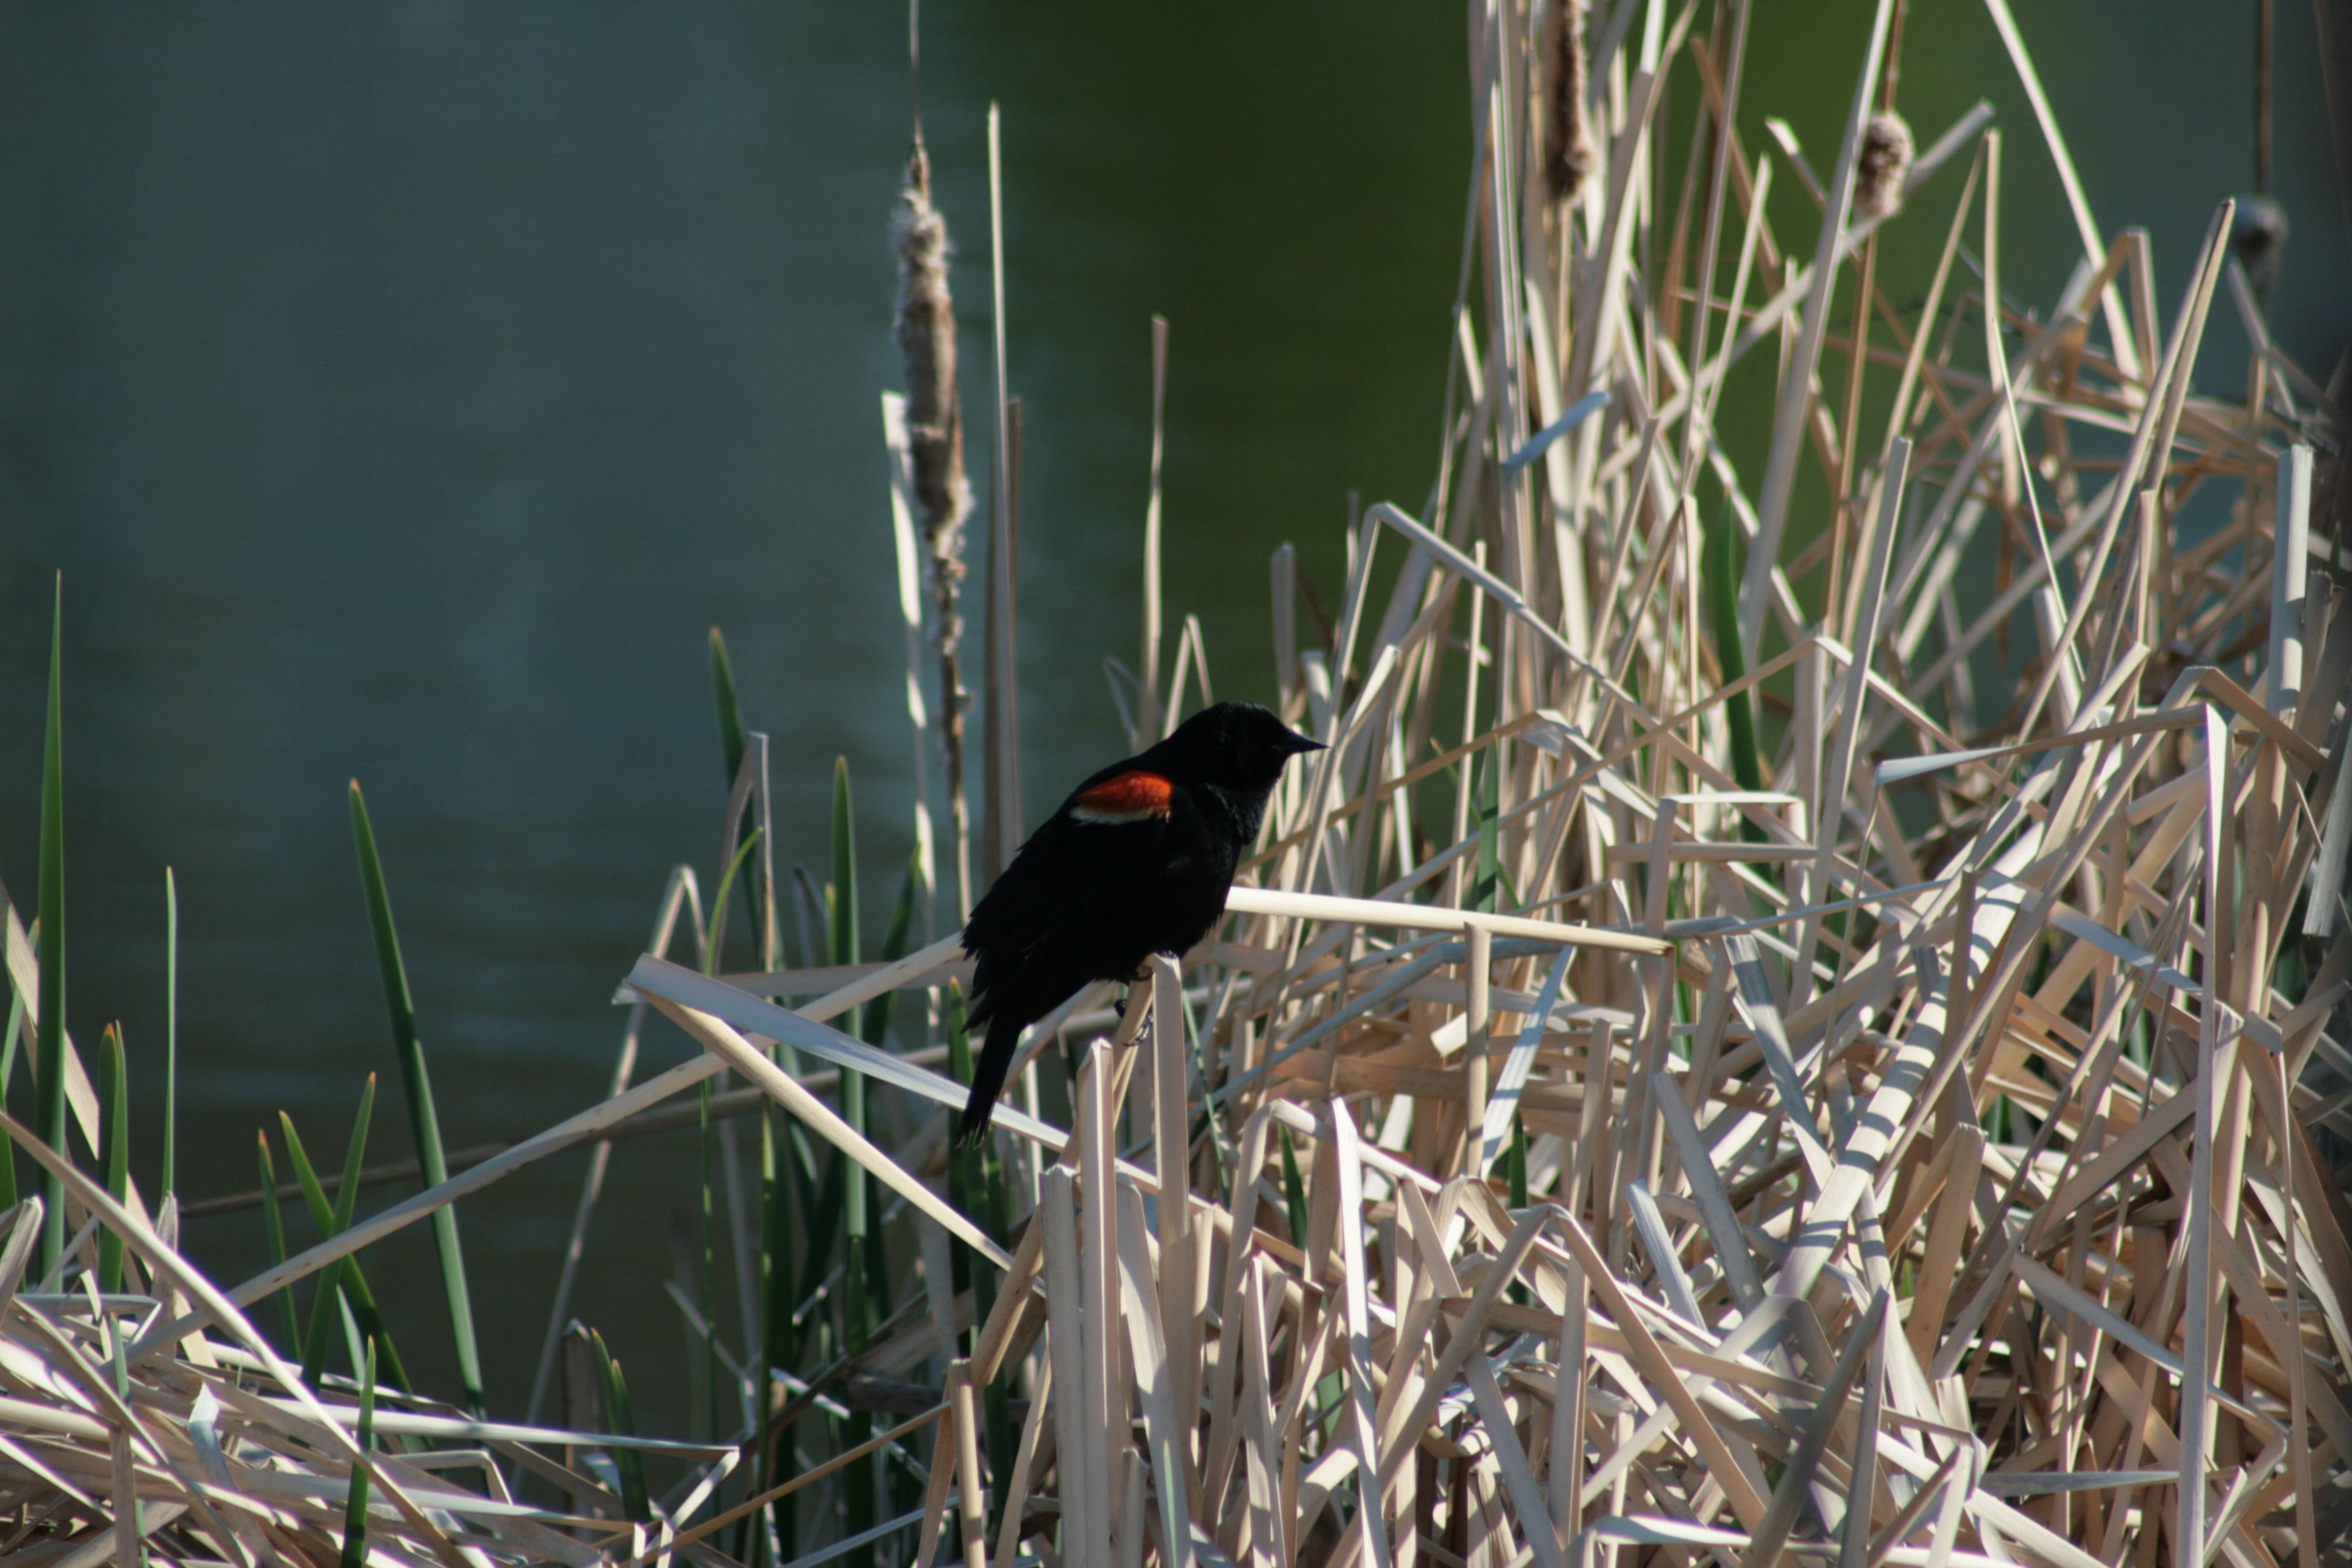 Male Red-winged Black Bird - Photo by Gerald Kornelsen